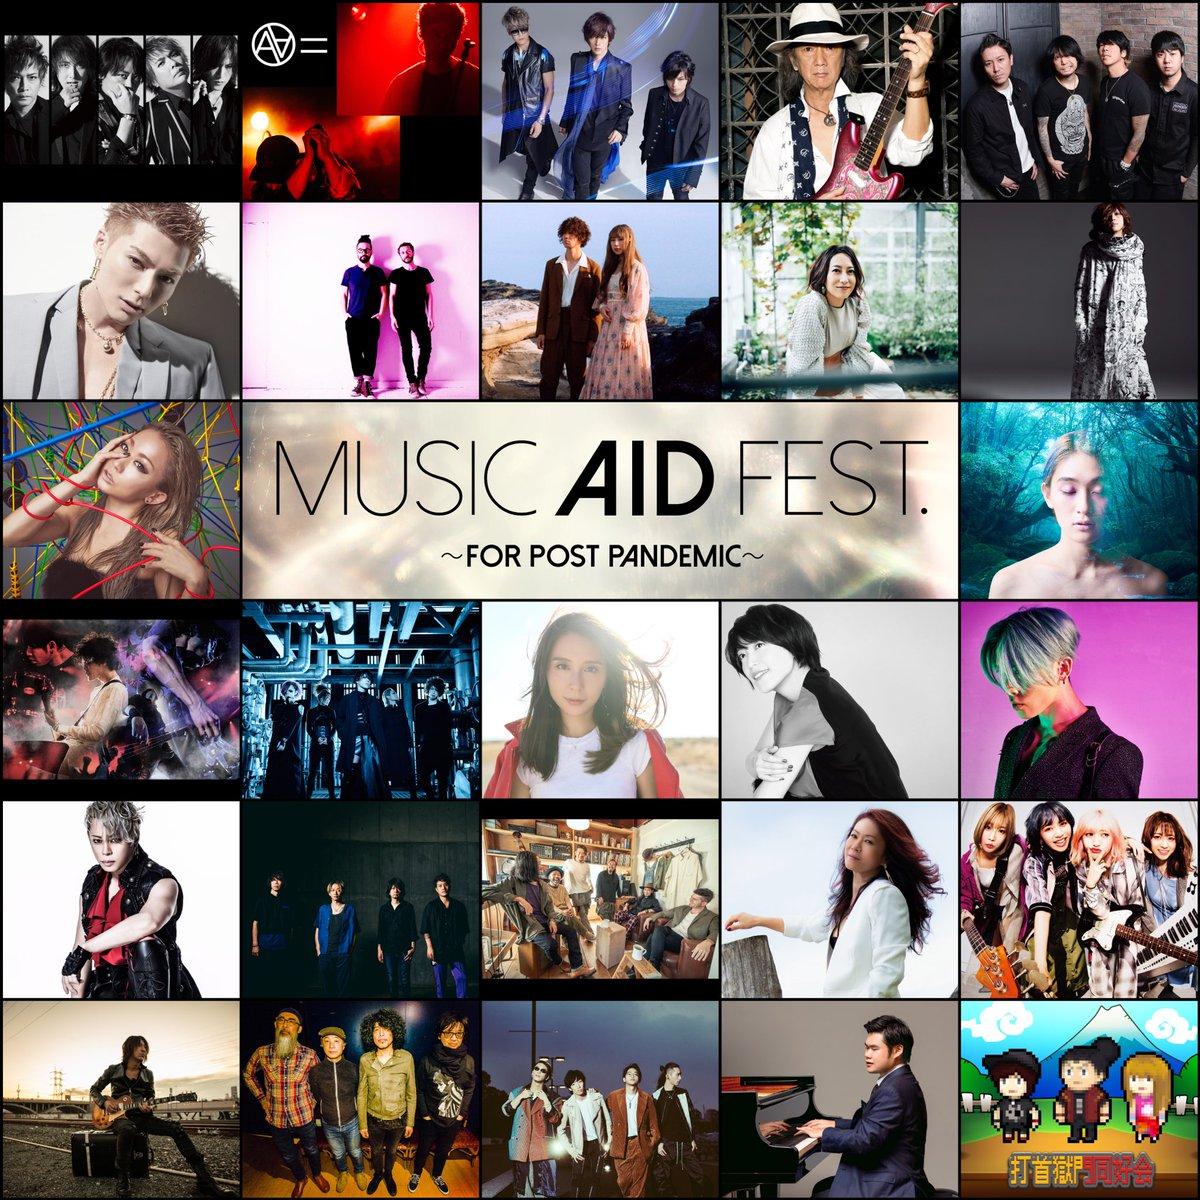 test ツイッターメディア - いよいよ今夜18時より! 素晴らしいアーティストが集い、それぞれの大切な思いをみんなにお届けします。 同時に音楽的に最高に濃密で意義深い番組になります。 期待してね!  番組サイト:https://t.co/djpvRNkyJF 配信サイト:https://t.co/ww5HB8SxaY  #musicaidfest https://t.co/c8y4IzhEh2